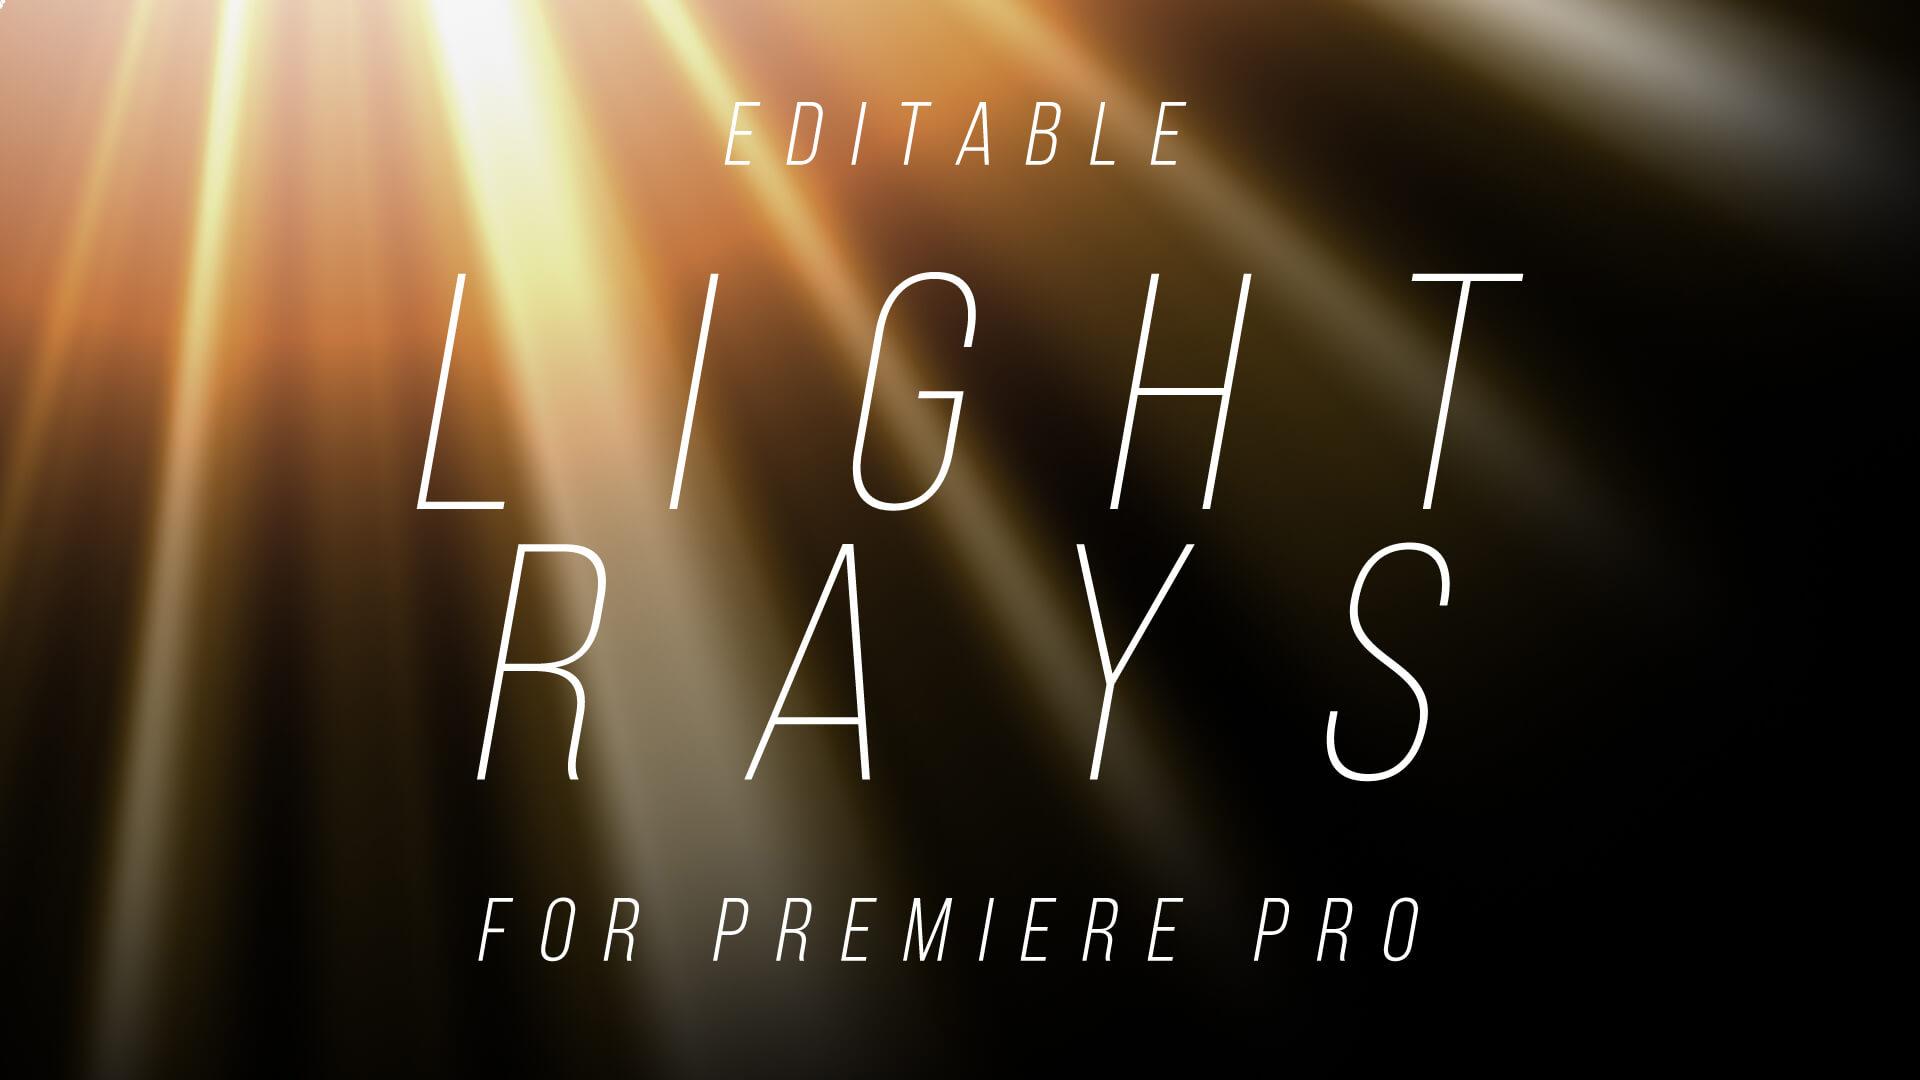 Radial Light Rays Overlay Premier Pro Template